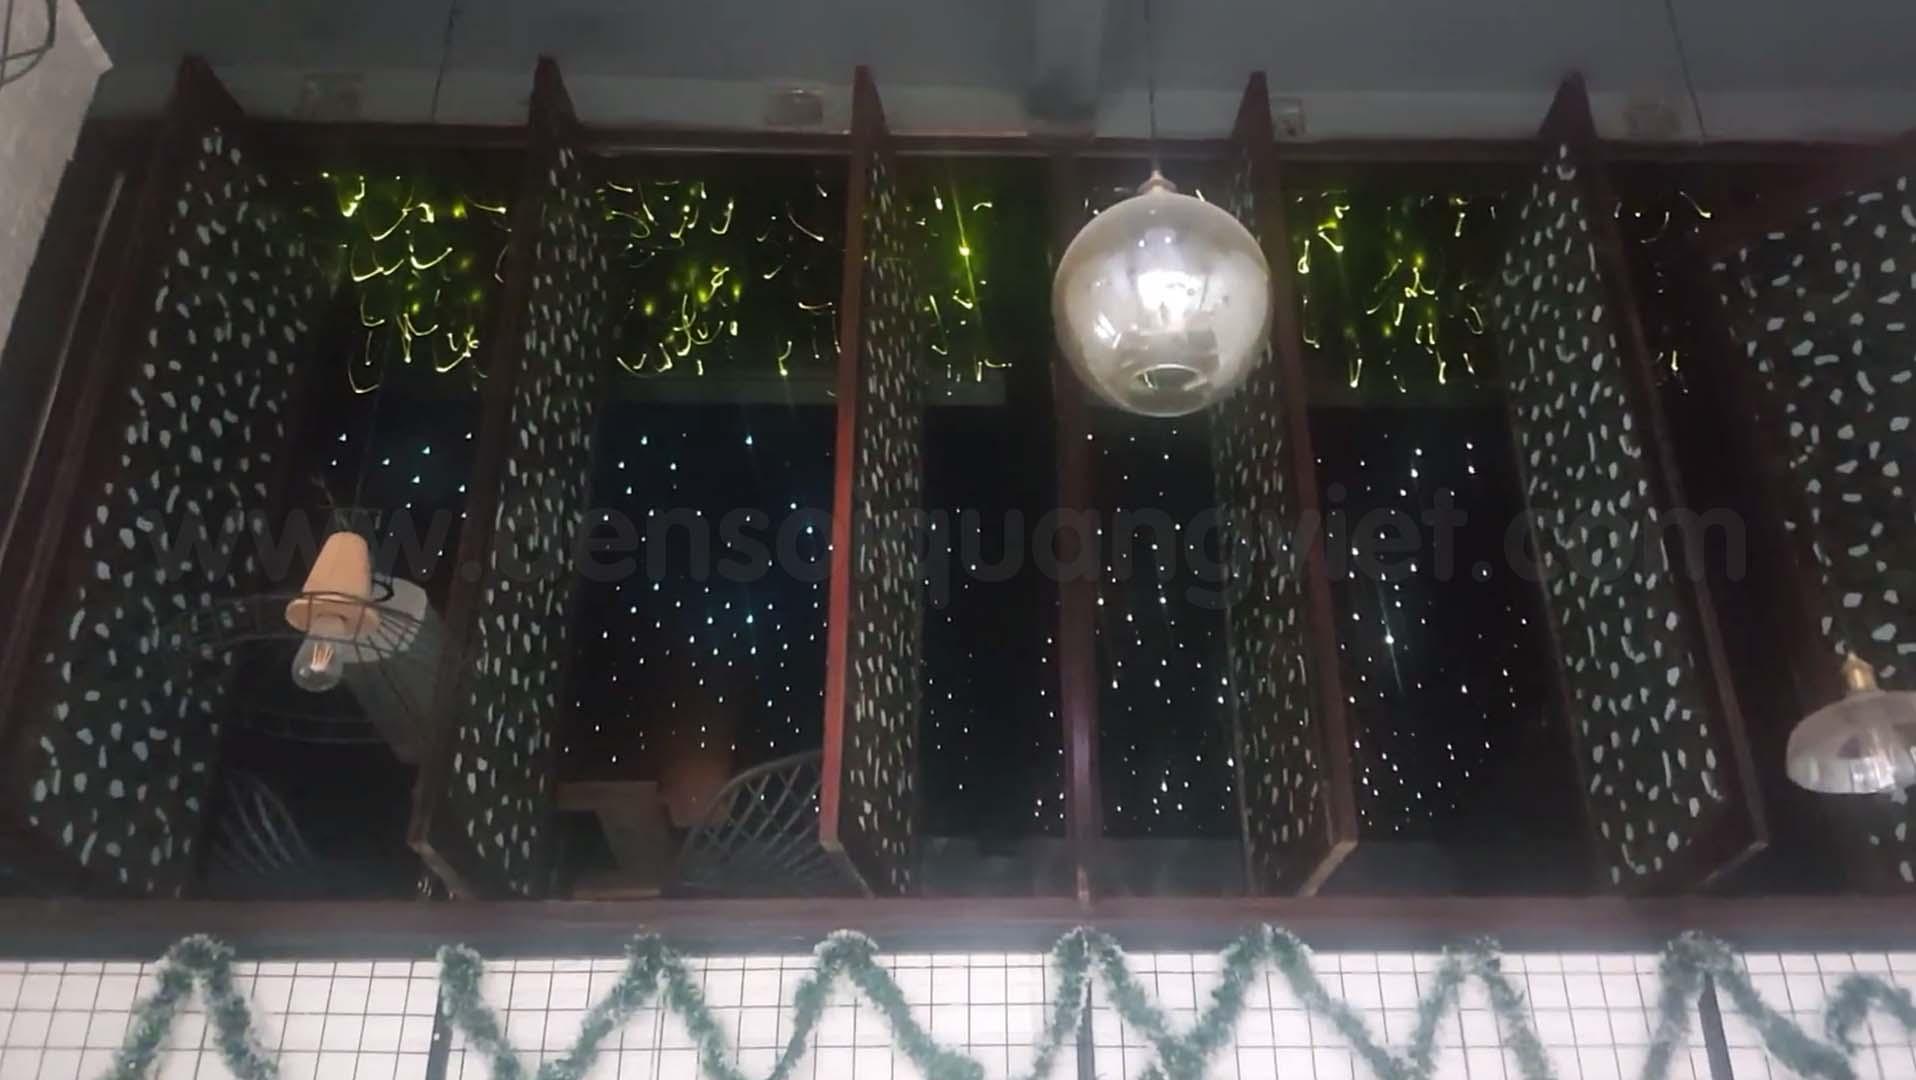 Tran sao nhan tao cafe shisha 5 - CAFE SHISHA HẢI PHÒNG